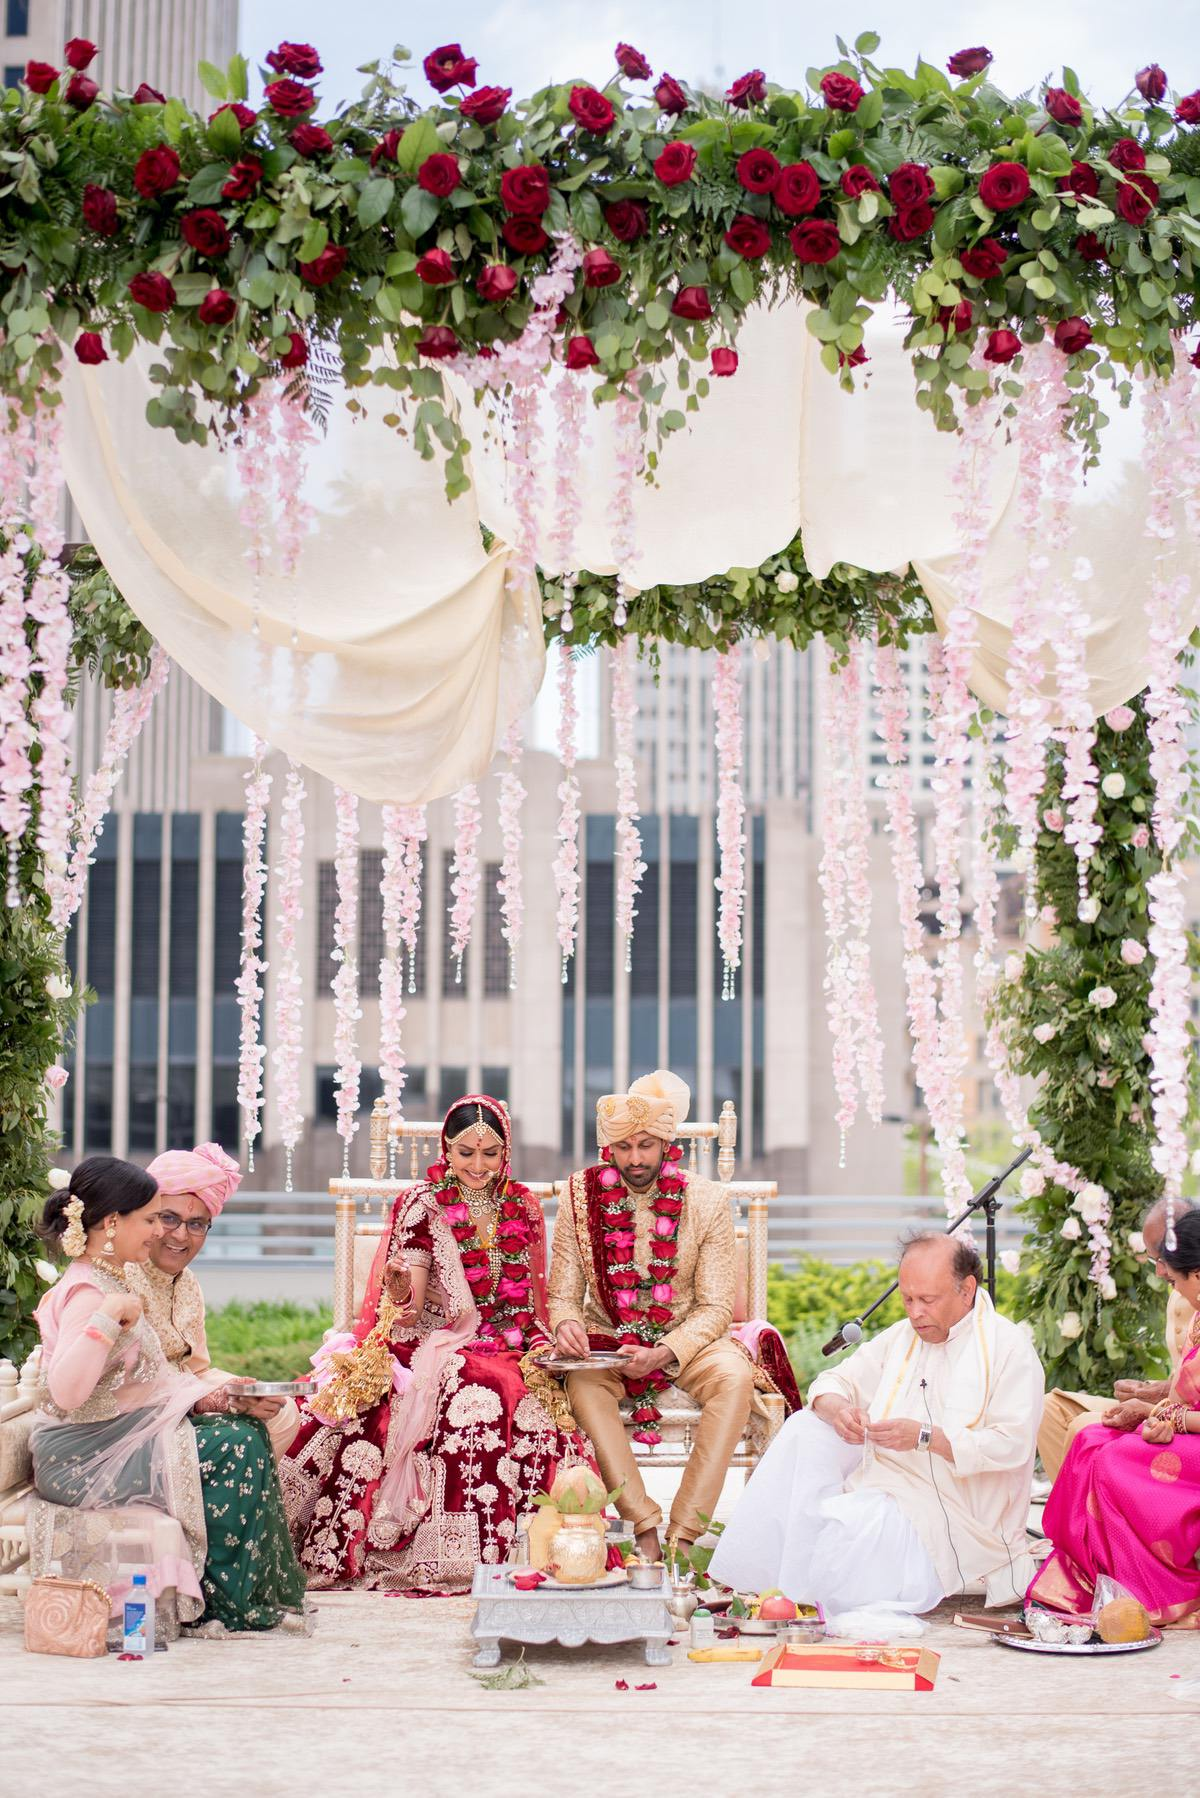 Le_Cape_Weddings_-_Serena_-_Chicago_South_Asian_Wedding_-_Ceremony_--63.jpg